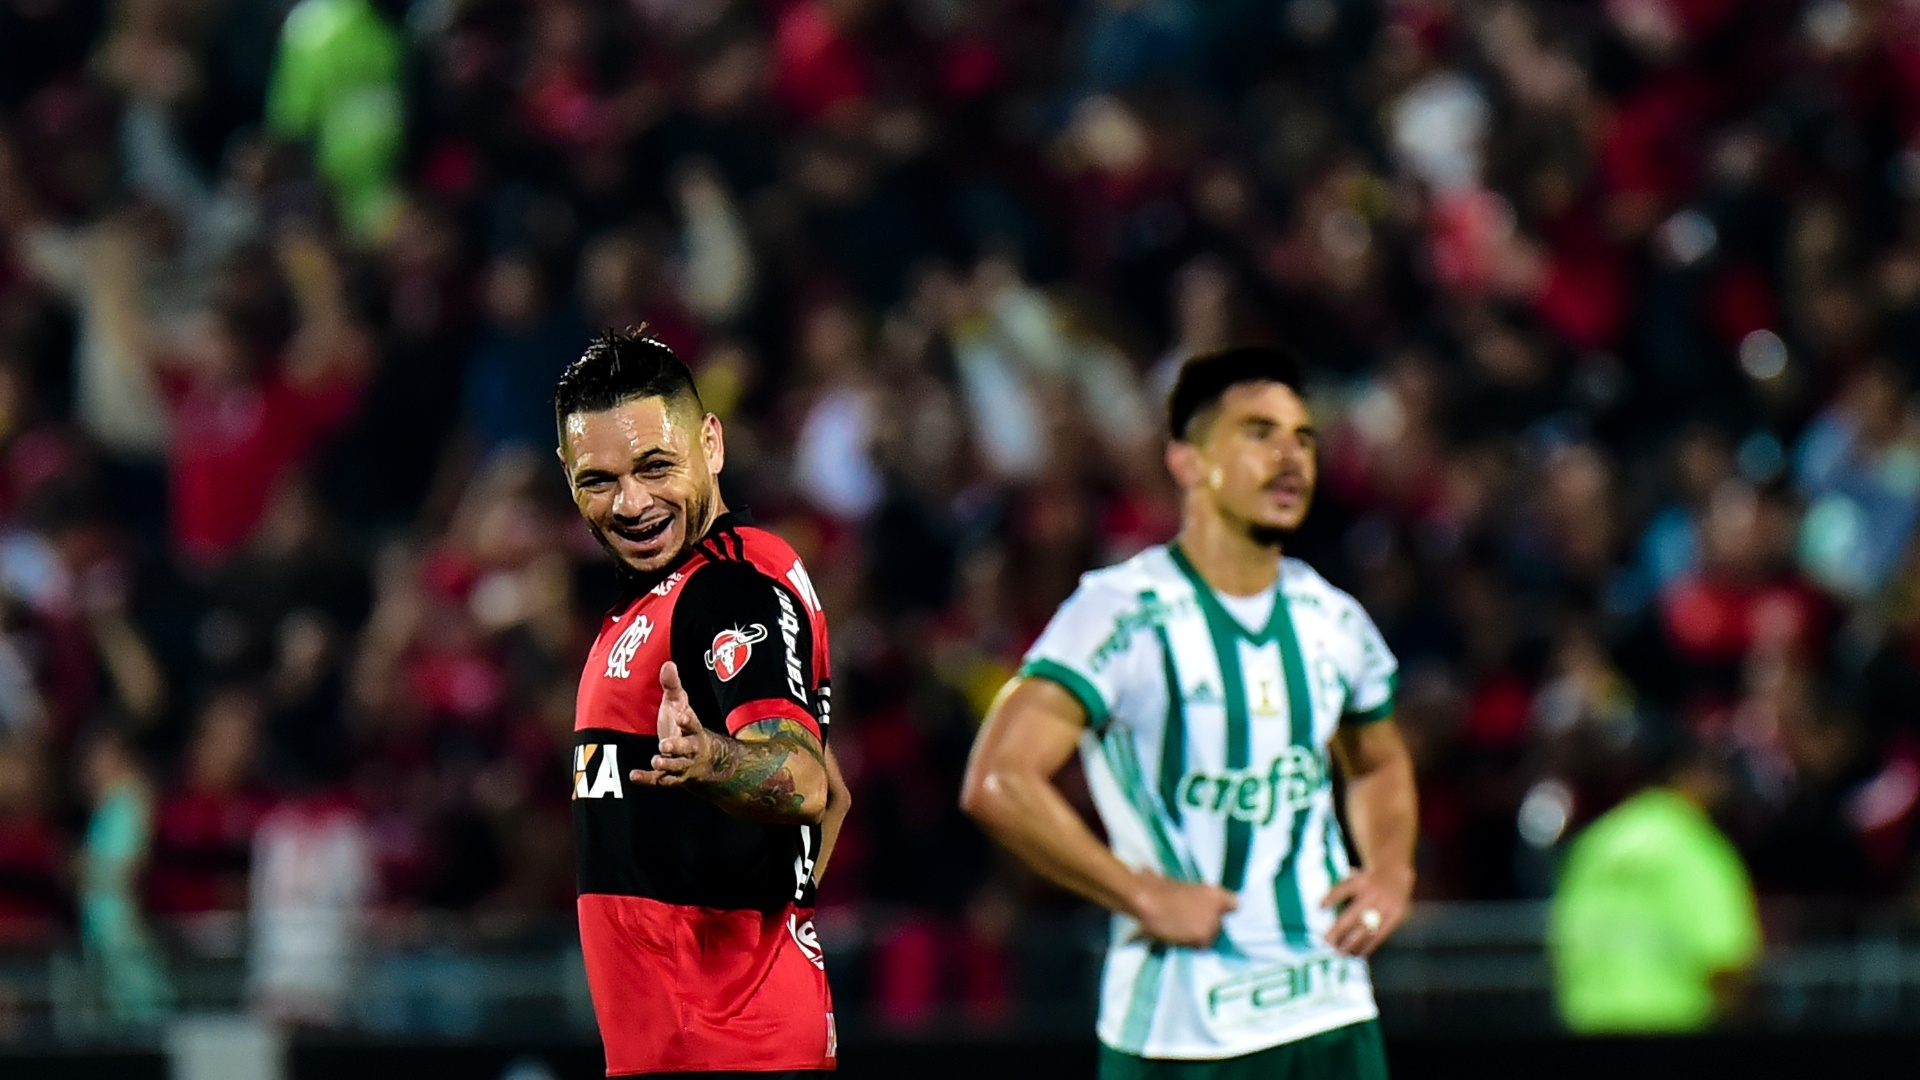 Pará comemora após marcar para o Flamengo contra o Palmeiras